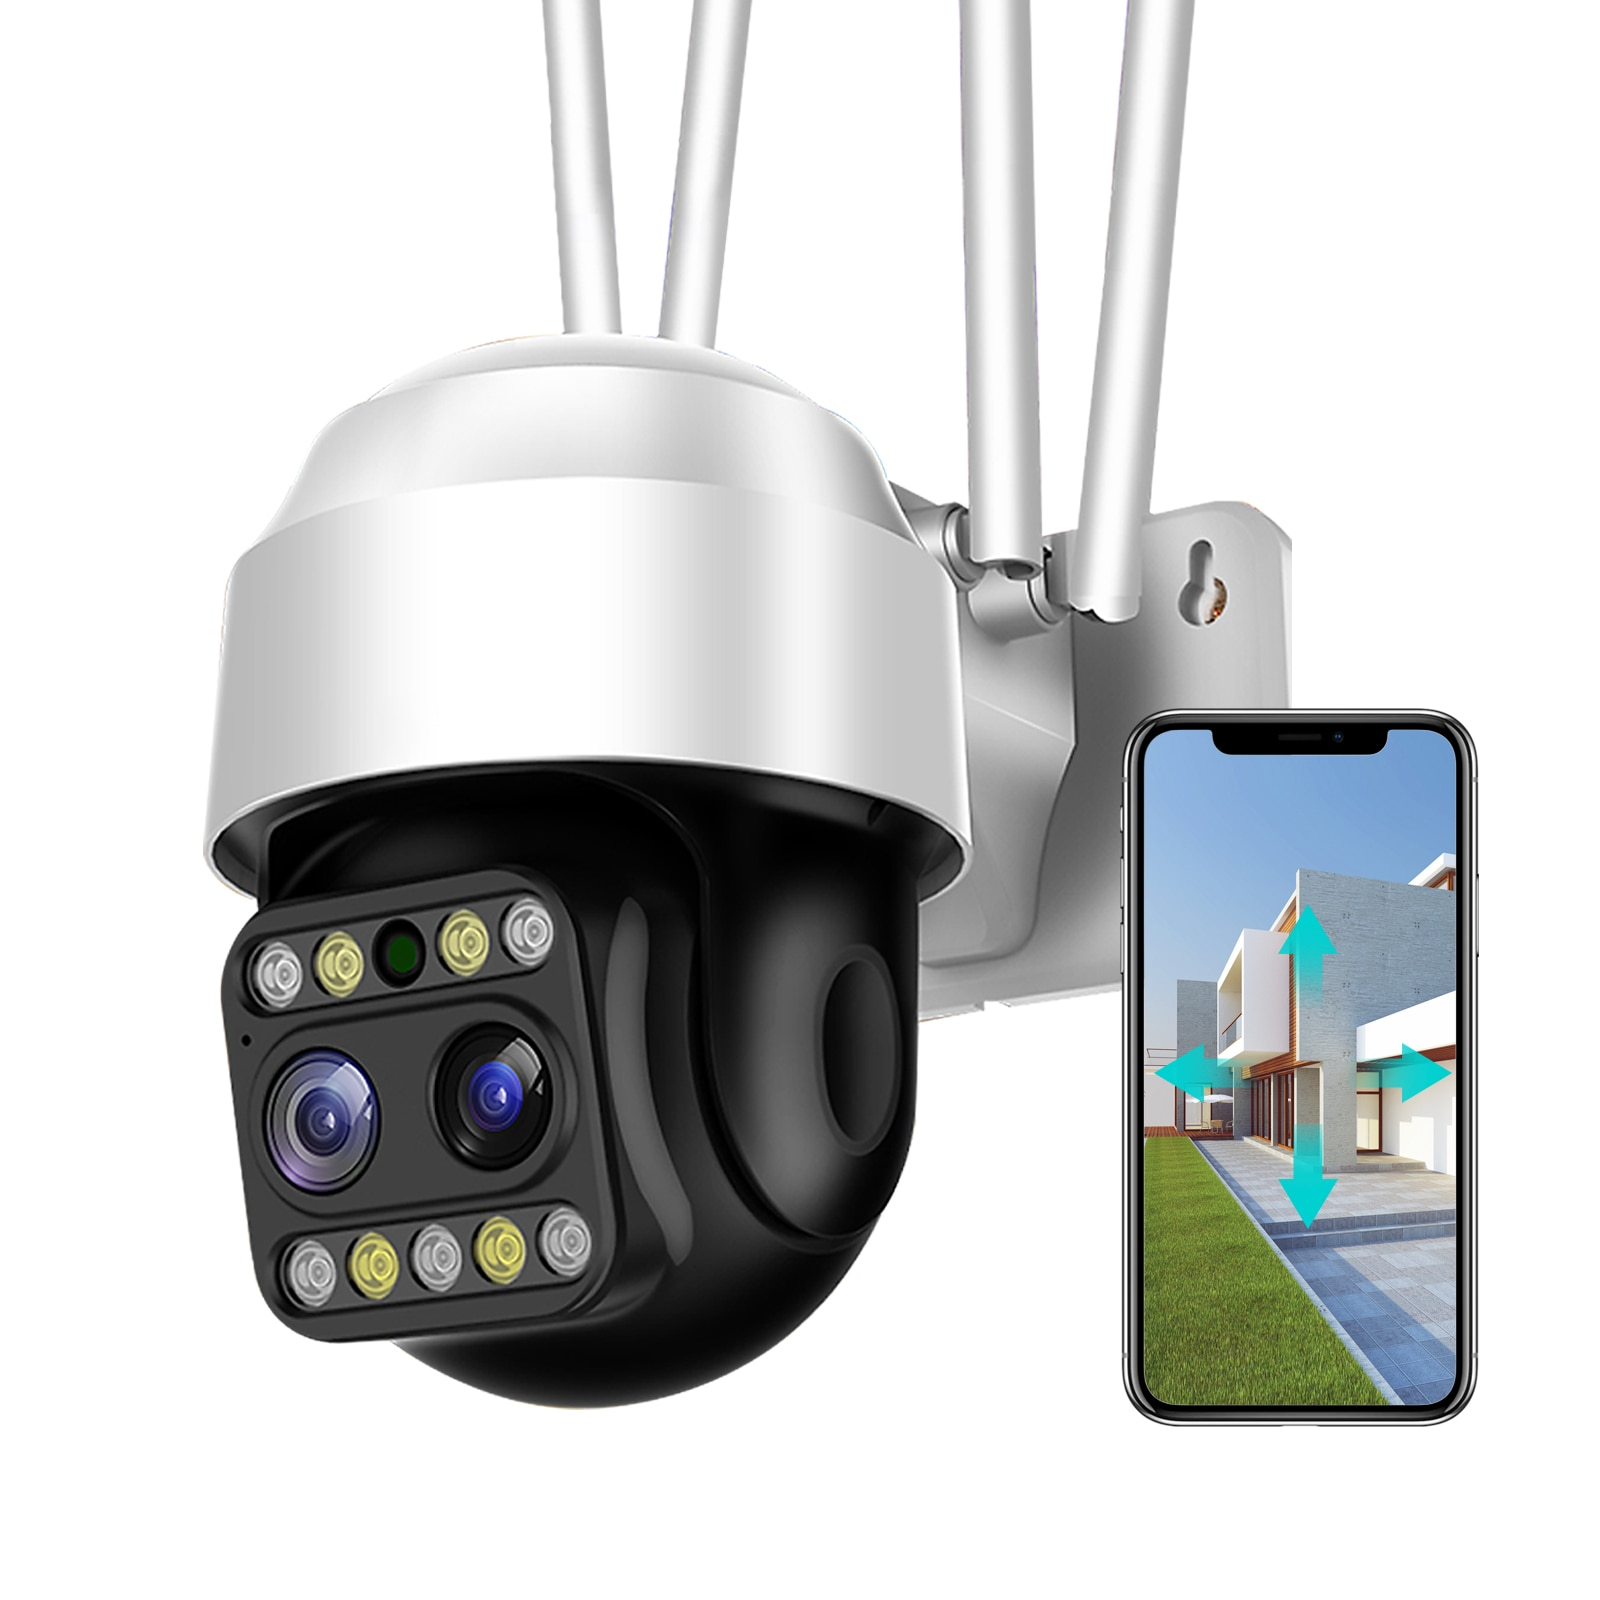 Sdeter-كاميرا مراقبة خارجية على شكل قبة PTZ IP Wifi hd 2MP/1080P ، جهاز أمان لاسلكي ، مع تقريب رقمي x4